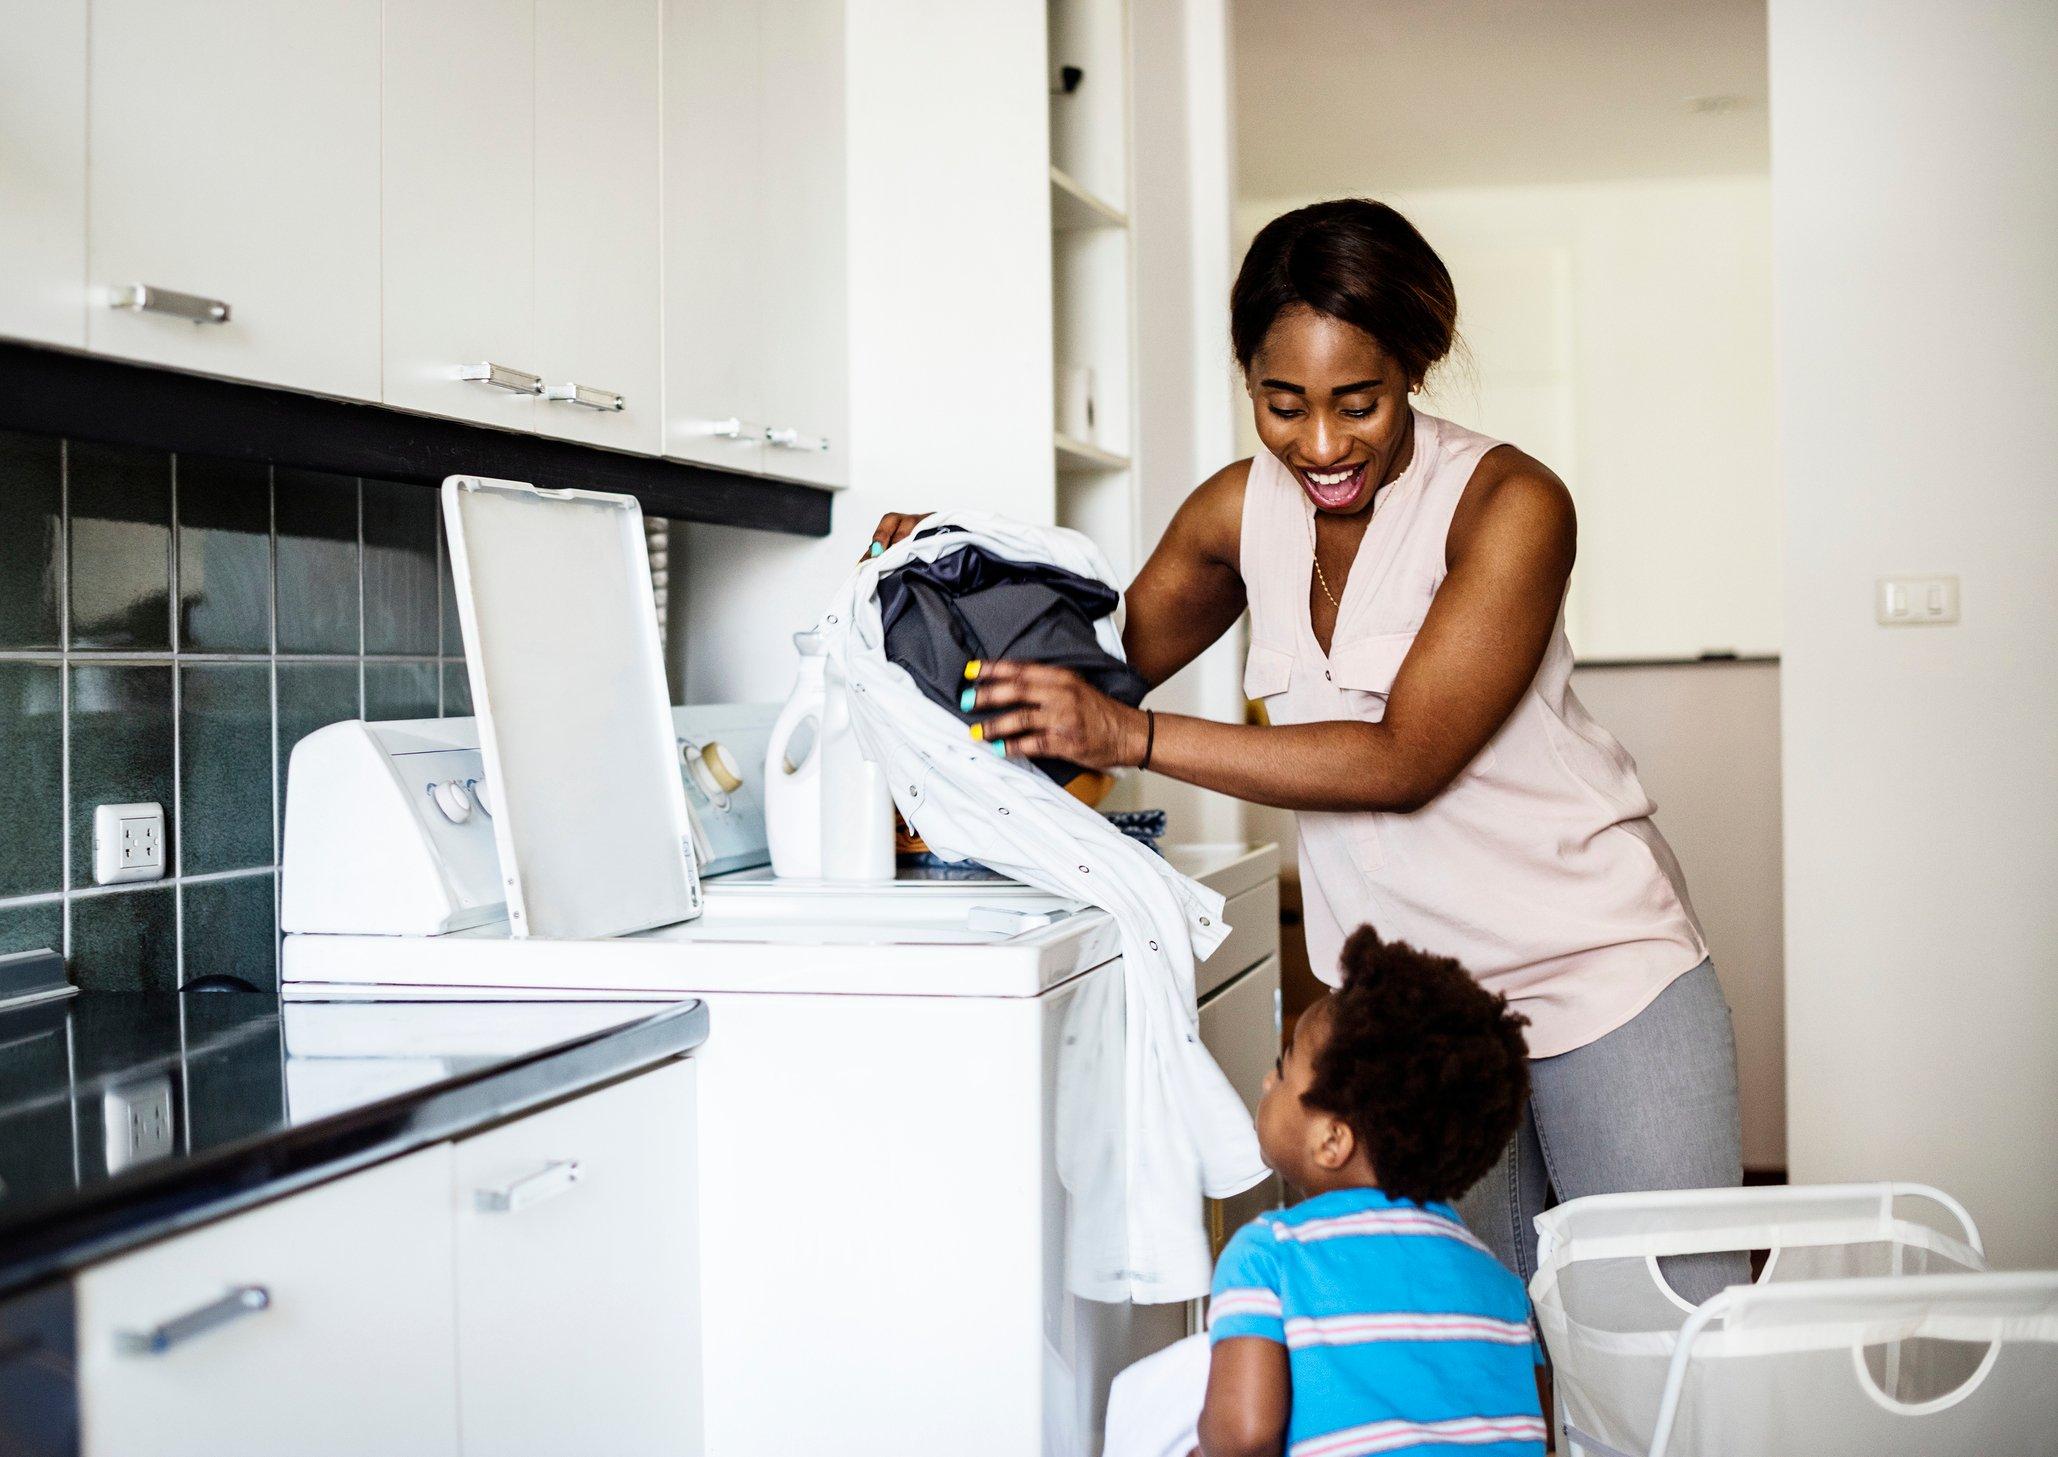 Mom helping son do laundry